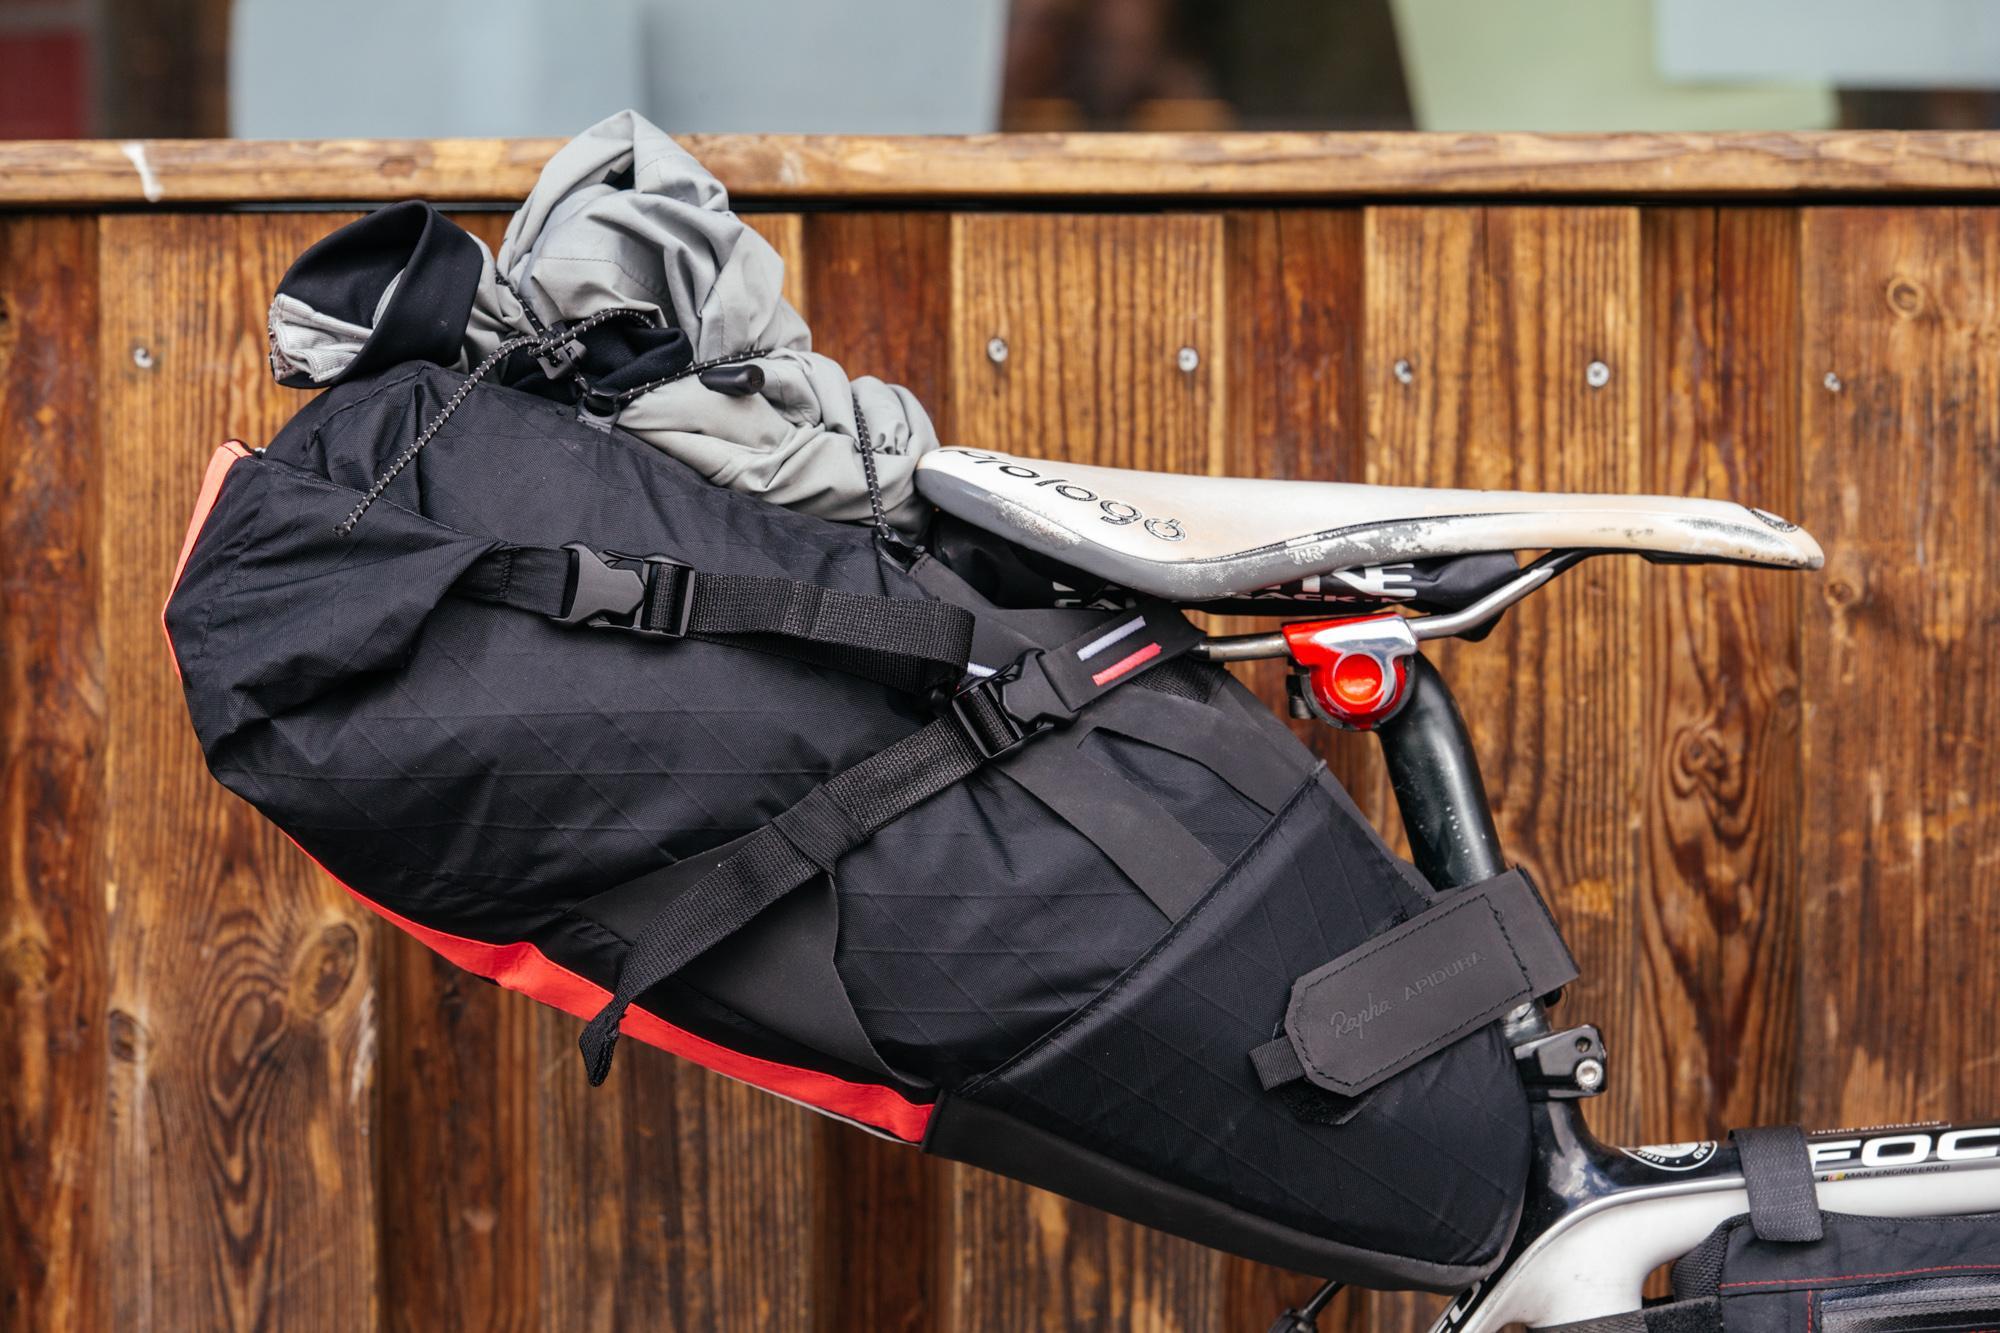 Sverigetempot_Bikes-4